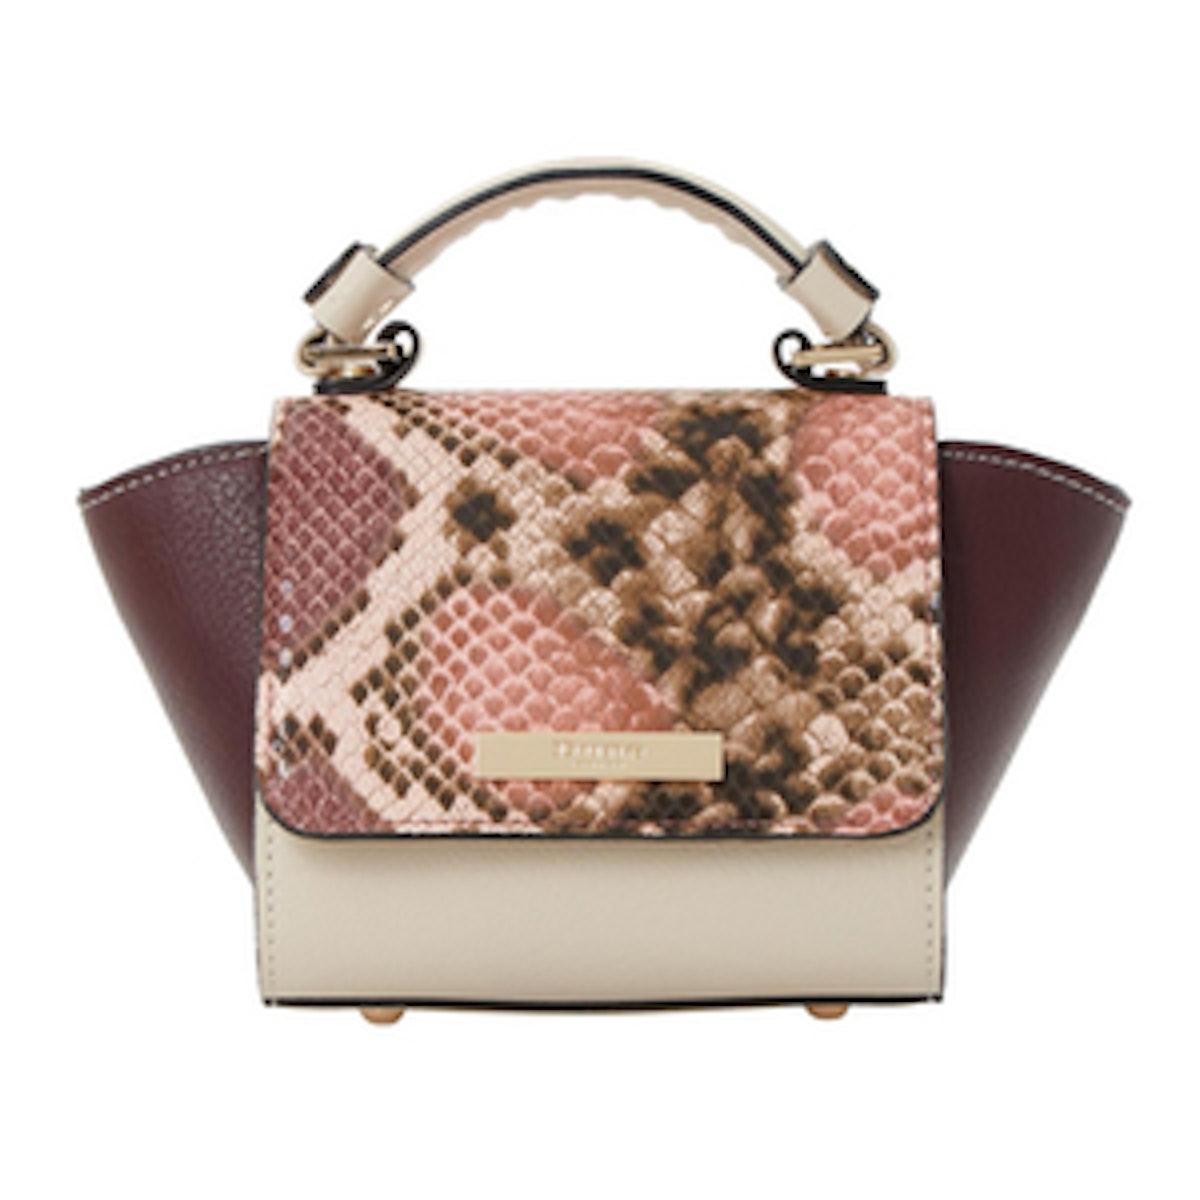 Winged Top Handle Micro Bag